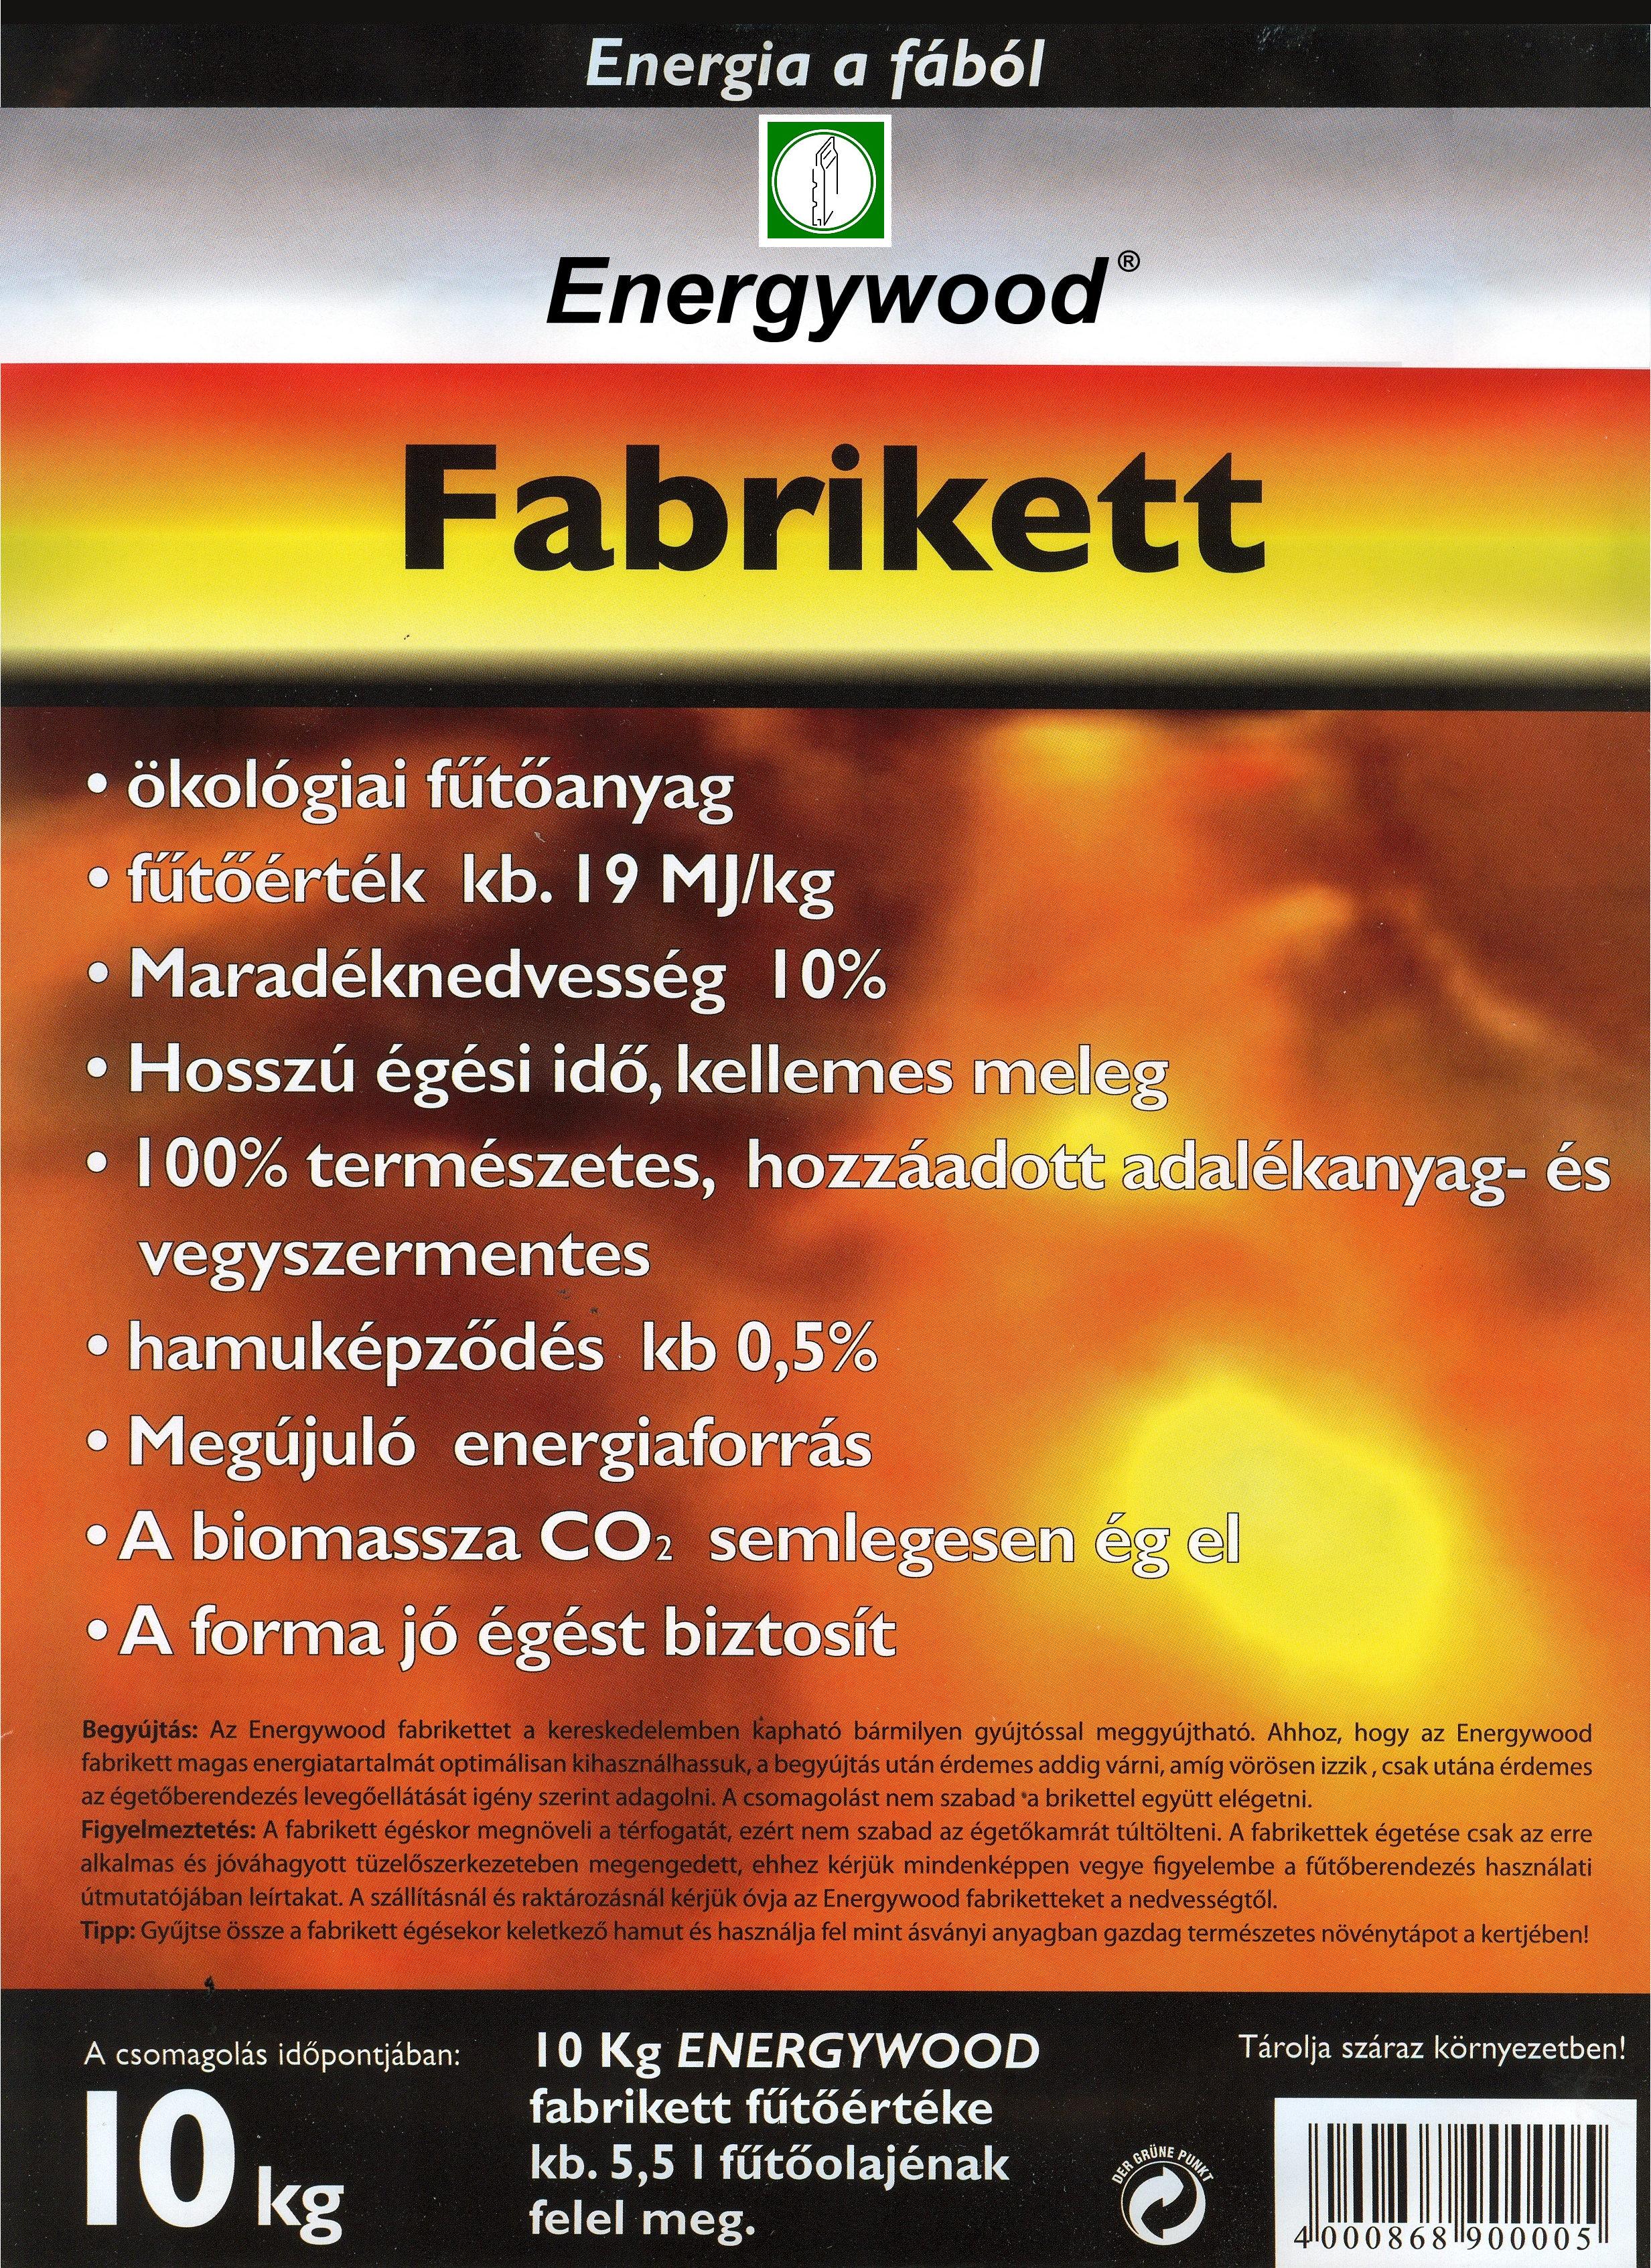 energia_fabol